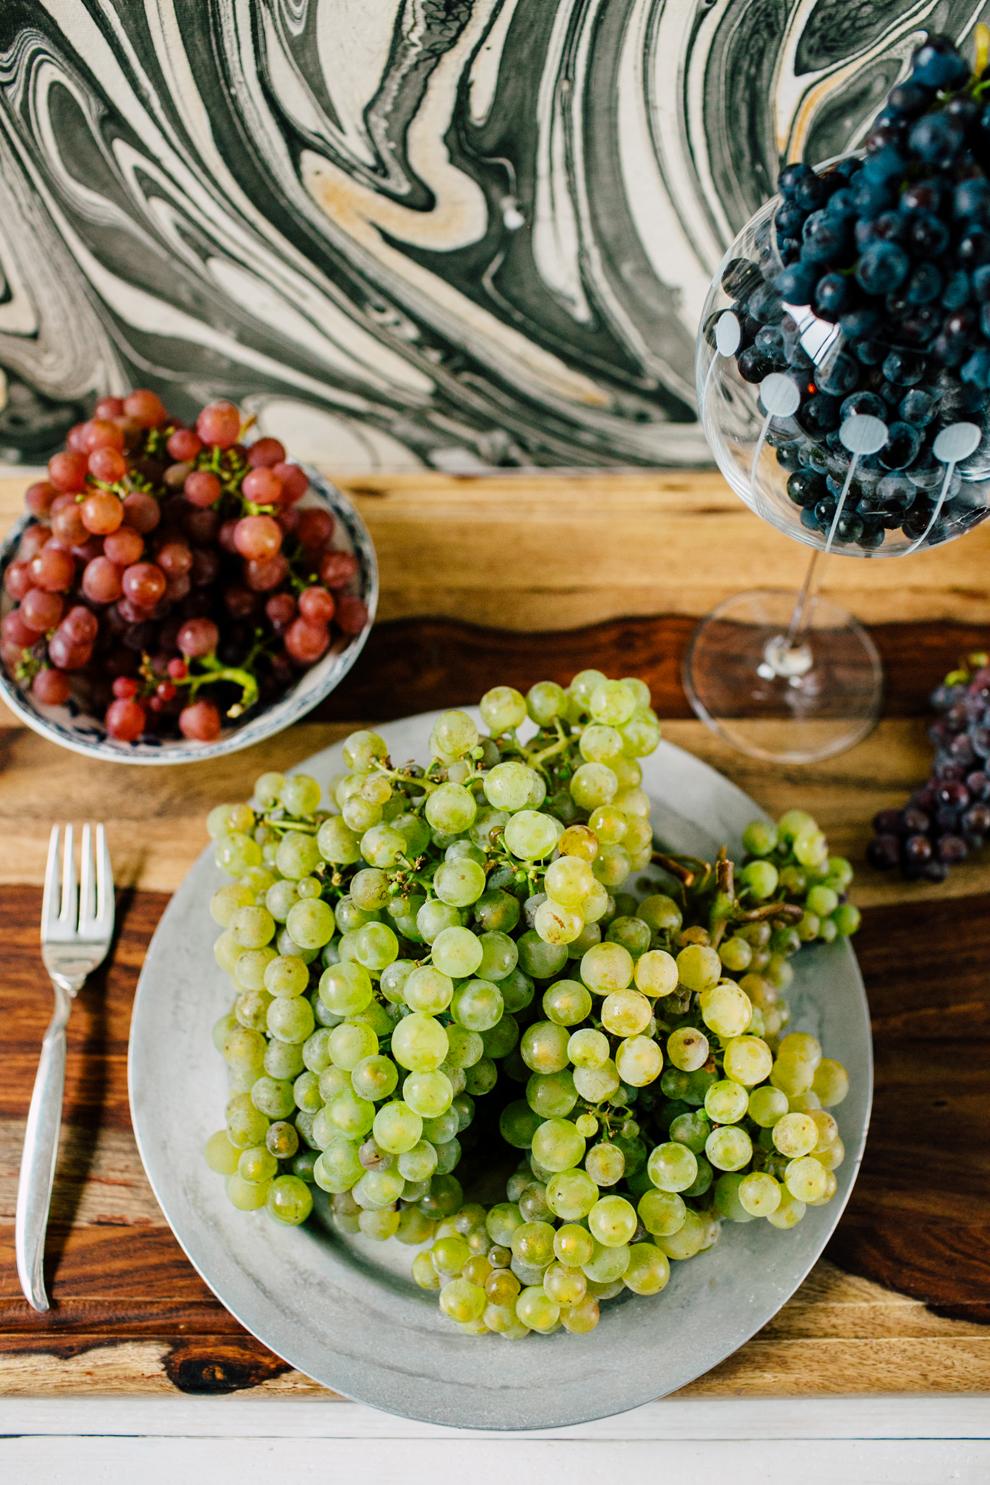 014-mount-baker-vineyards-grapes-food-bellingham-katheryn-moran-photography.jpg